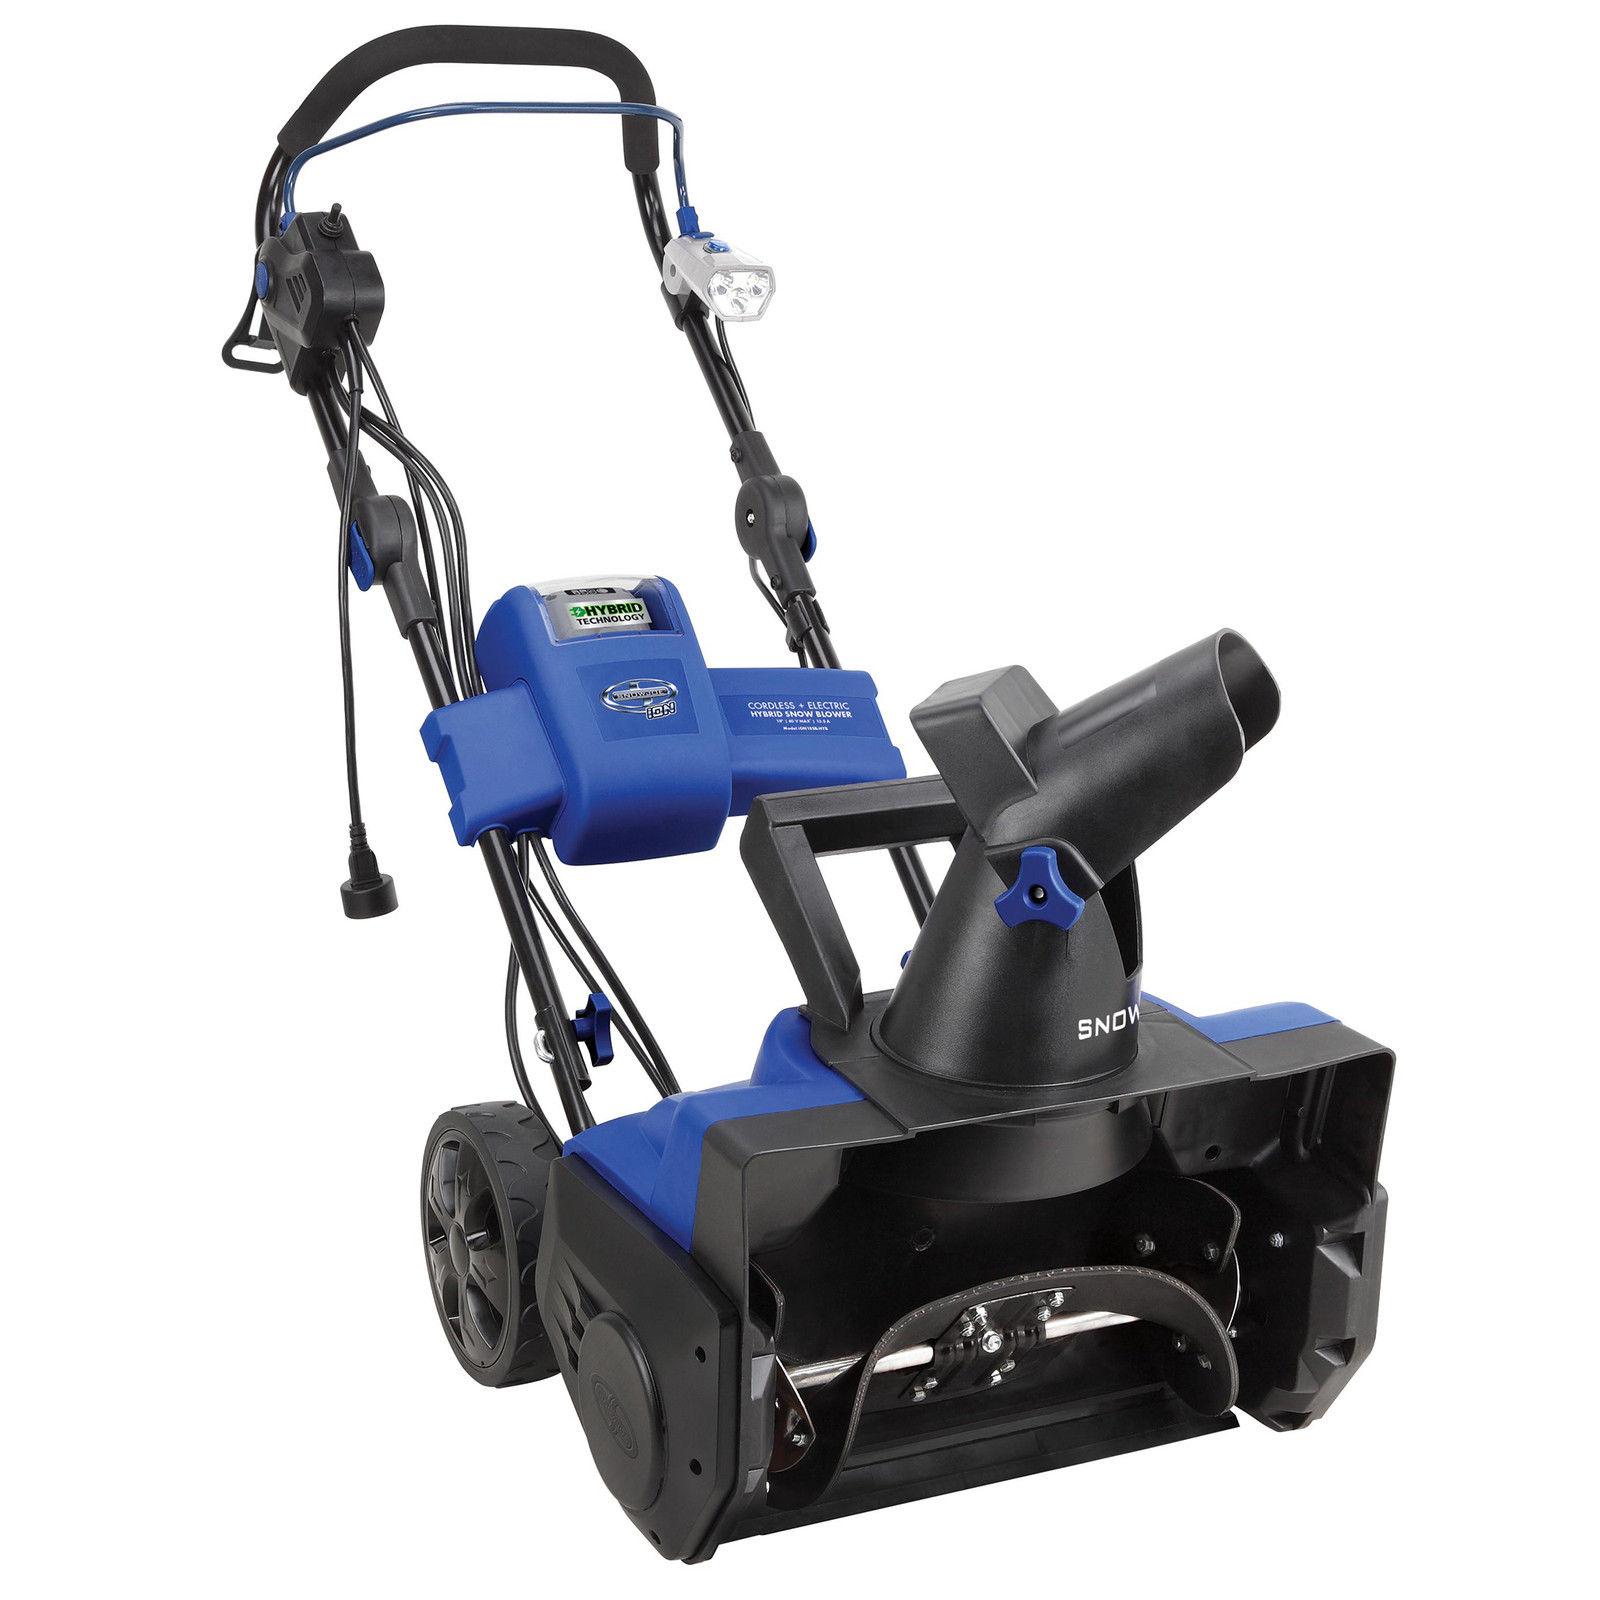 Electric Snow Blower : Snow joe hybrid cordless electric blower inch